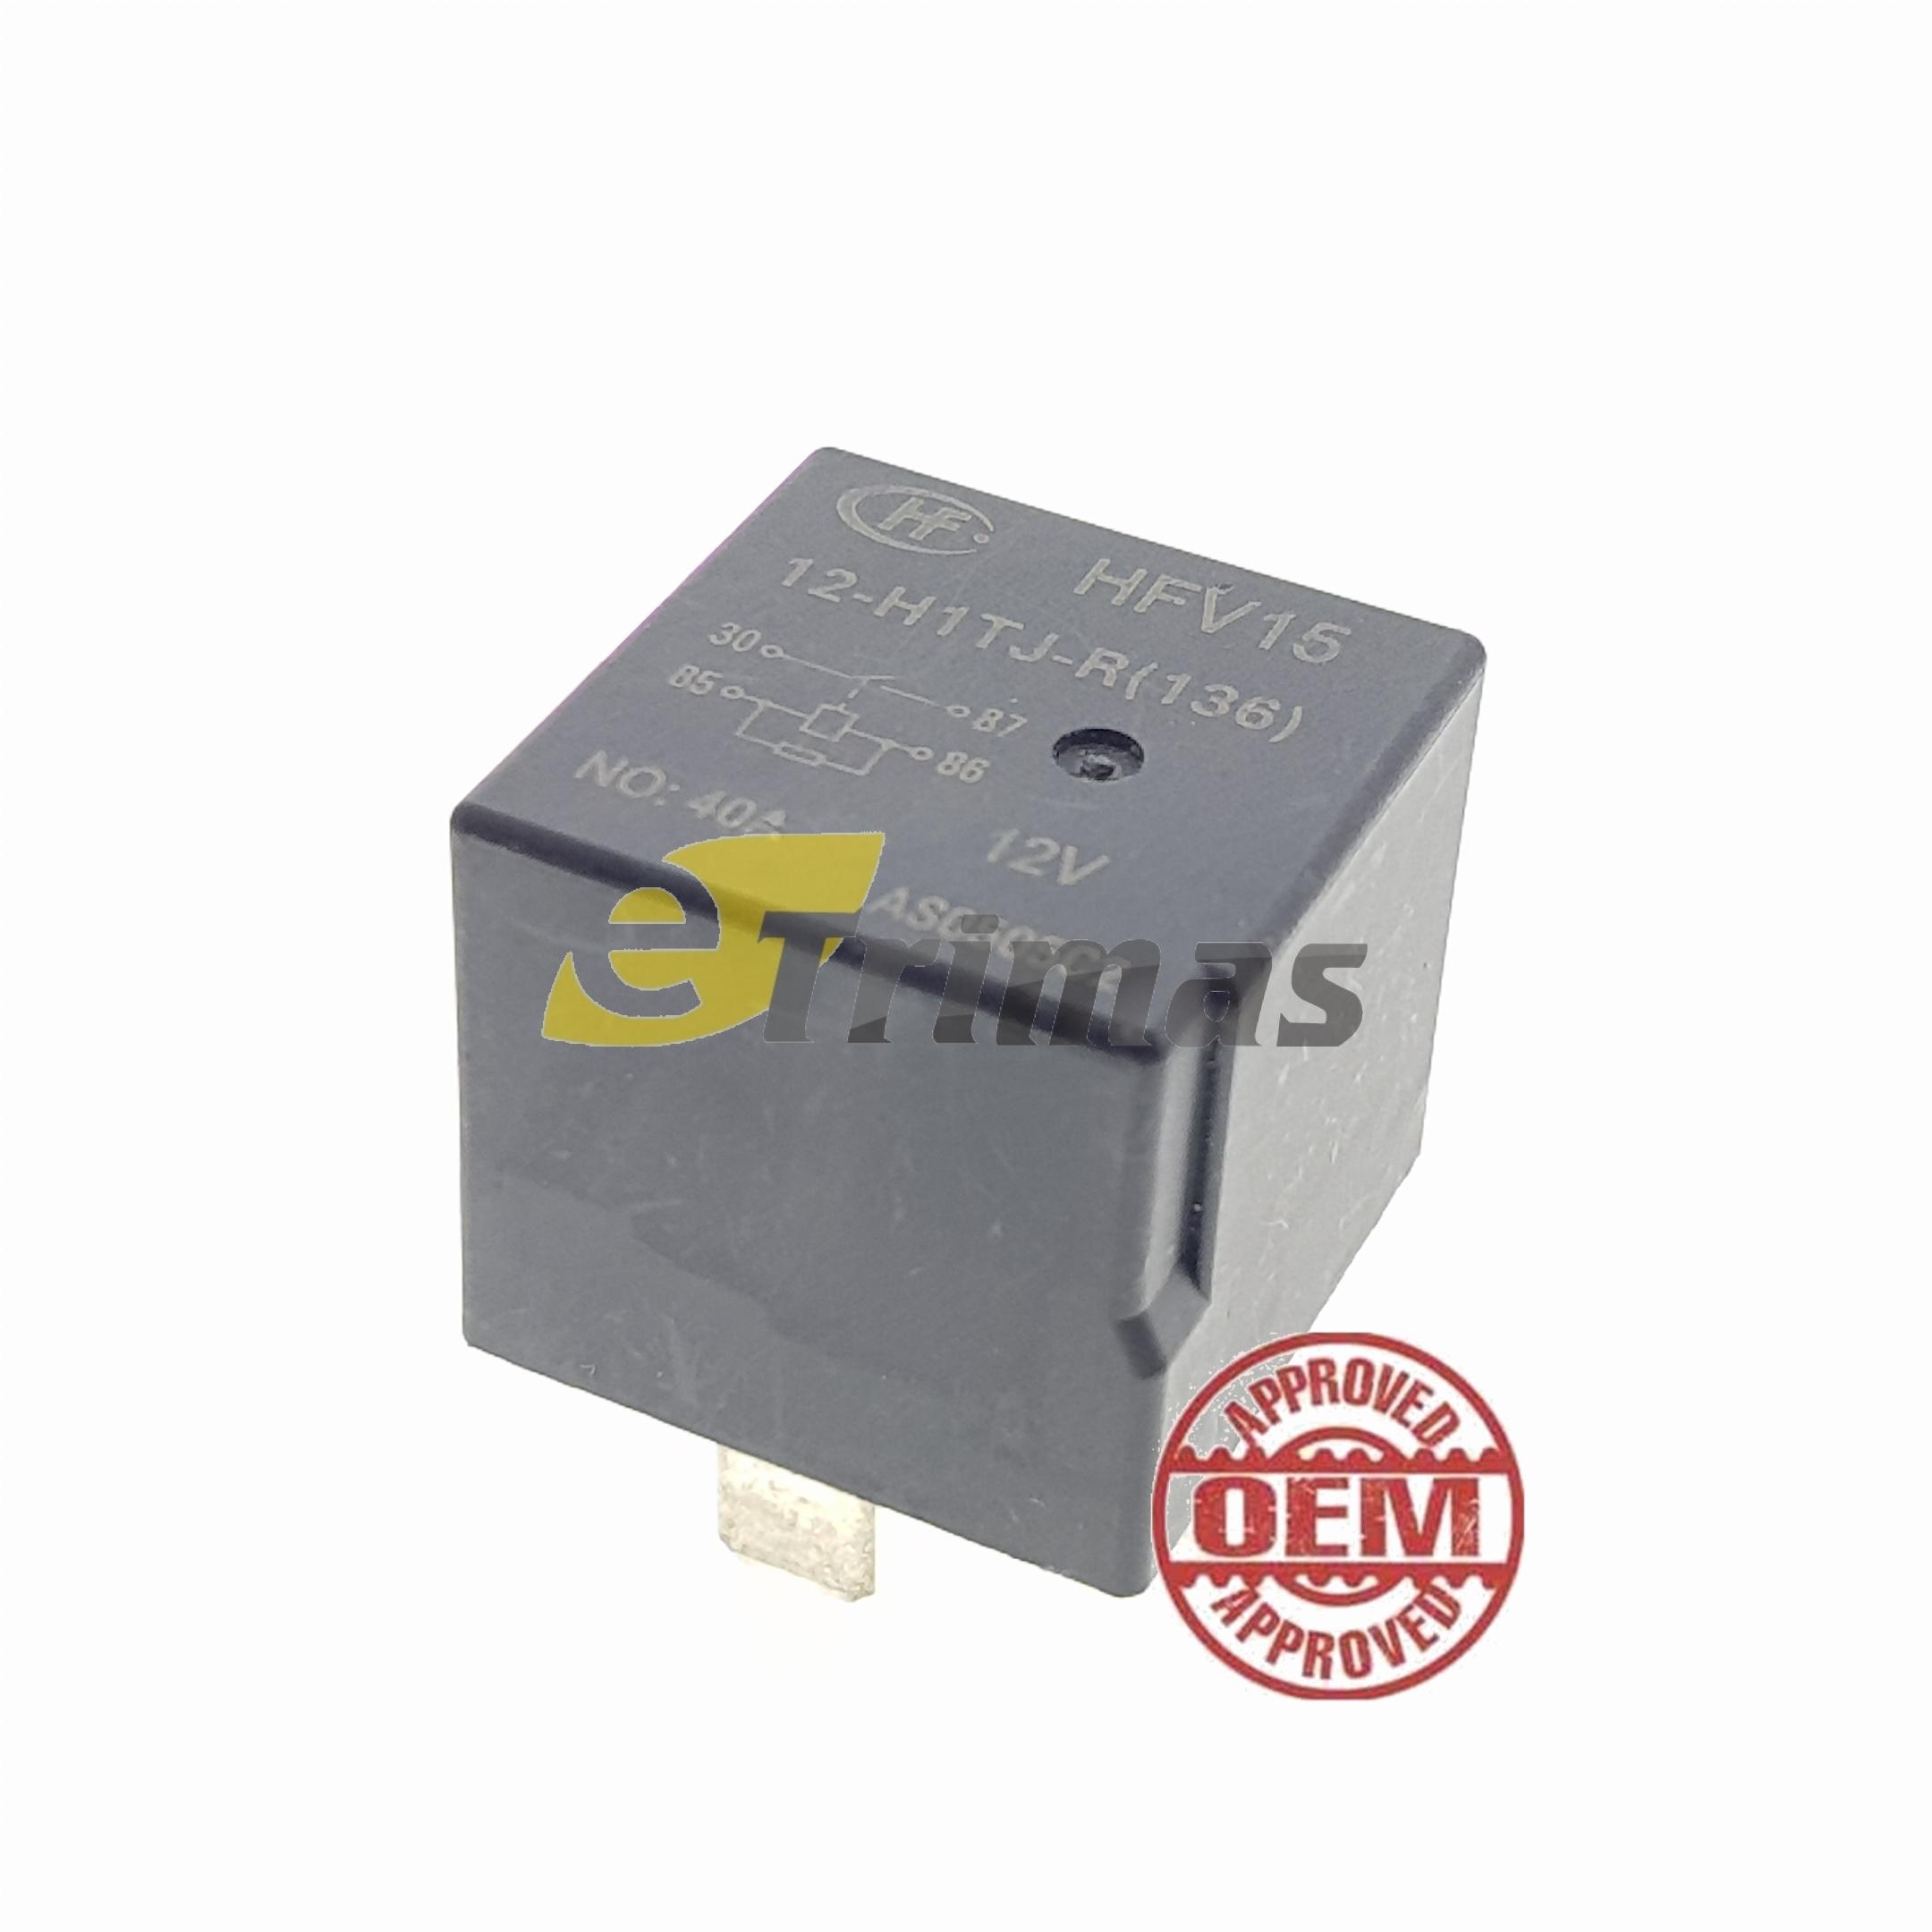 Proton Preve Suprima K1 K2 4pin 896 End 1 30 2021 1200 Am Relay 4 Pin Automotive Wire Harness 896e 1ah D R1